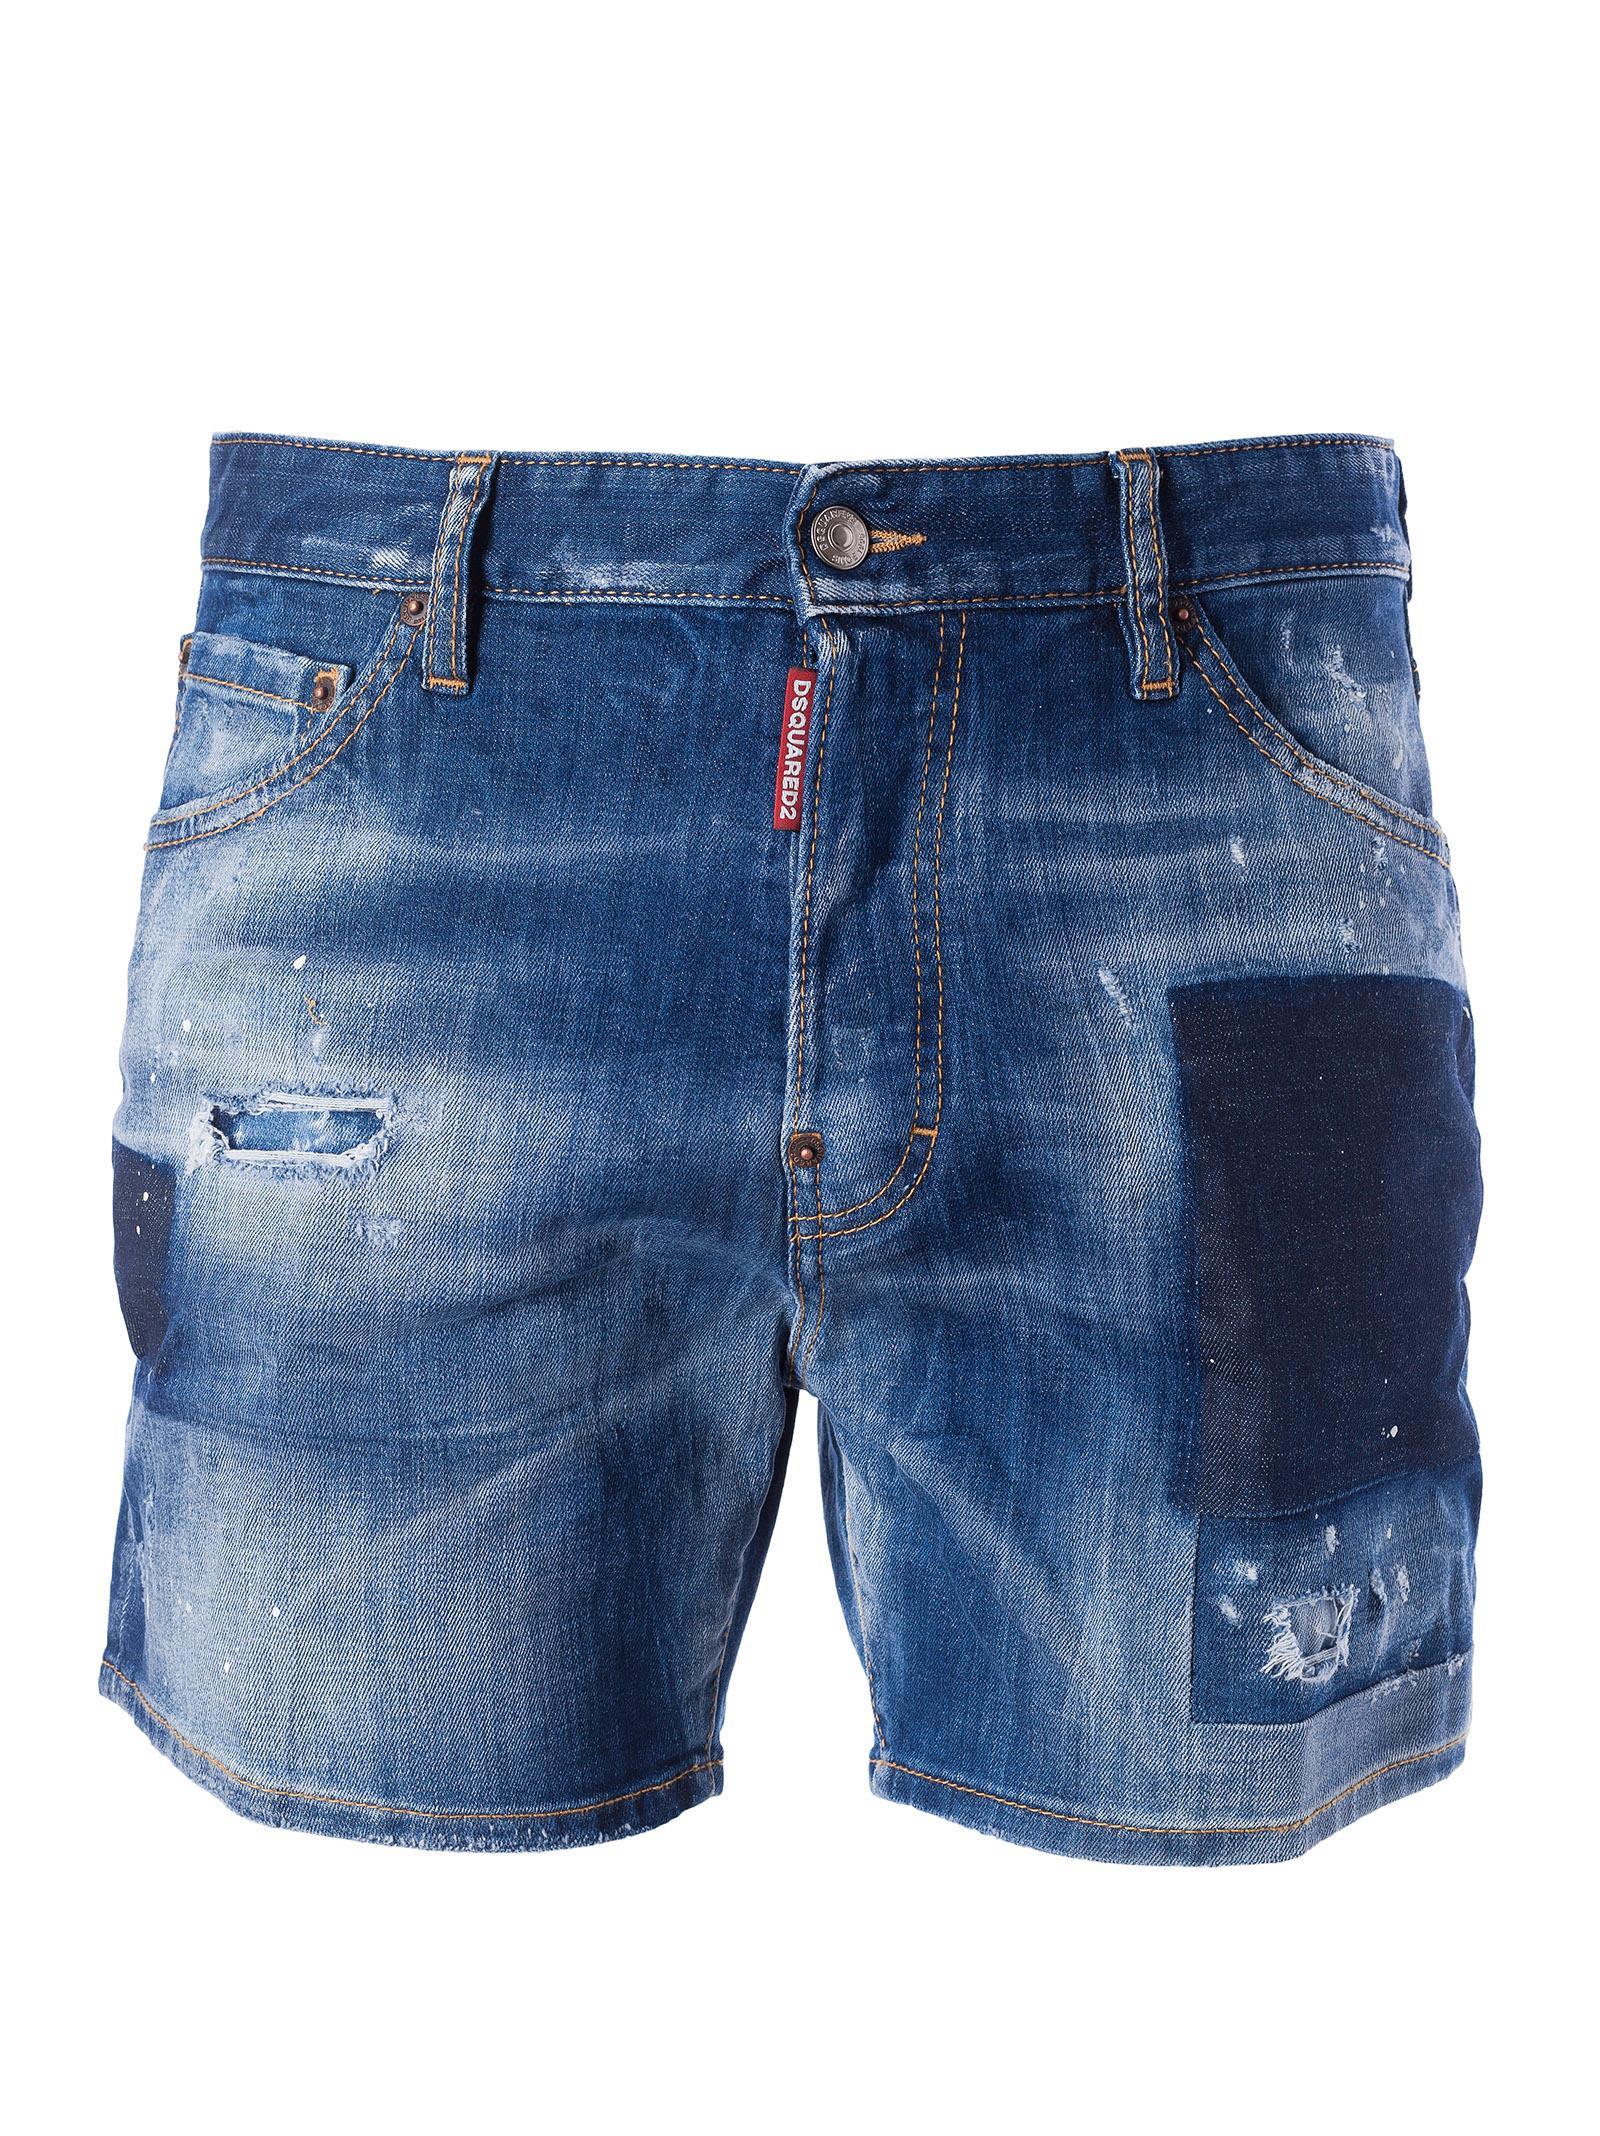 Dsquared2 Distressed Patch Denim Shorts